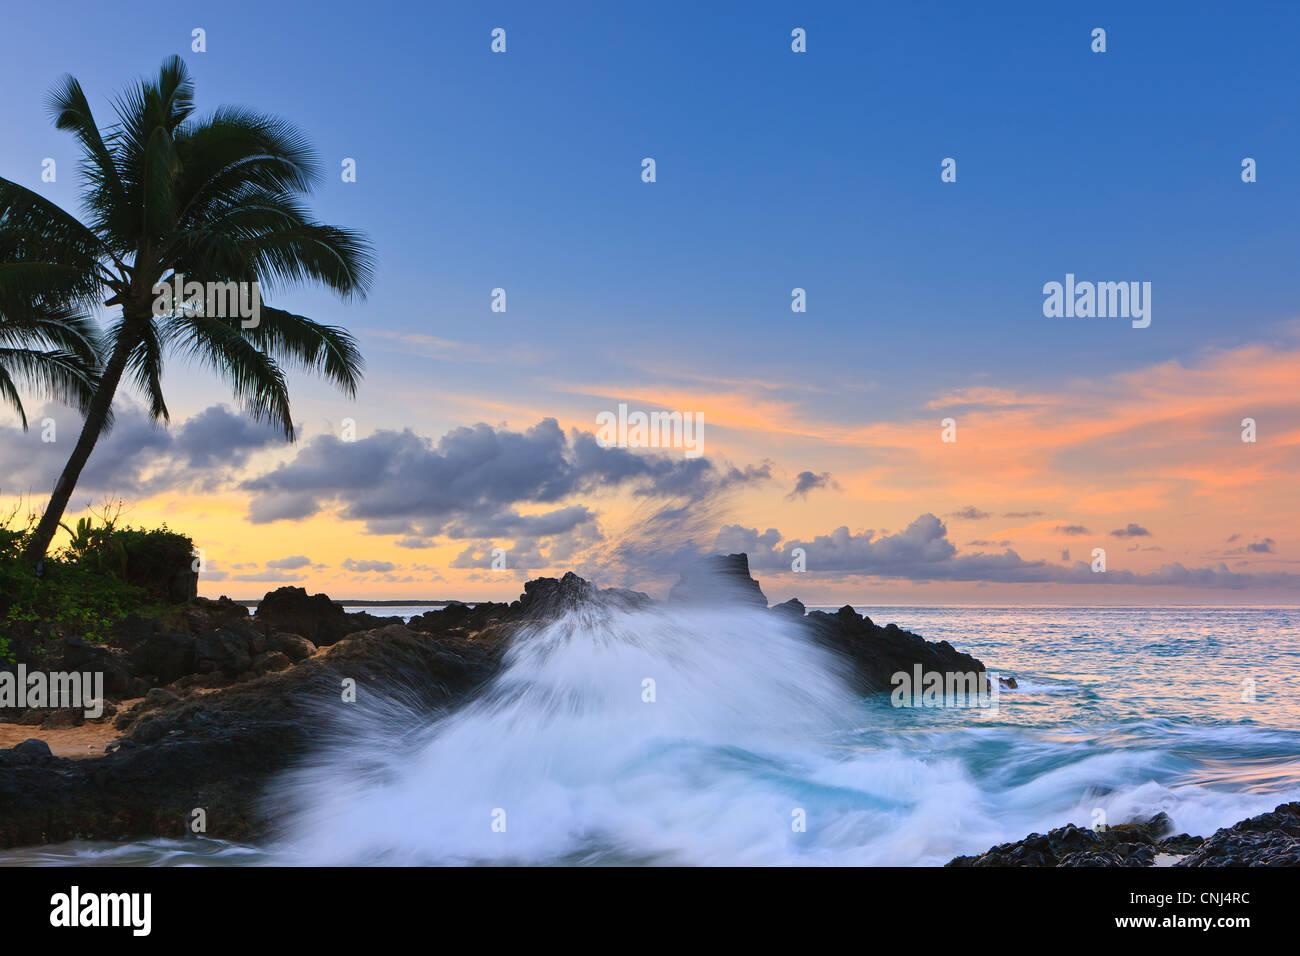 Sunrise at Secret Beach, Kihei, Maui, Hawaii Stock Photo